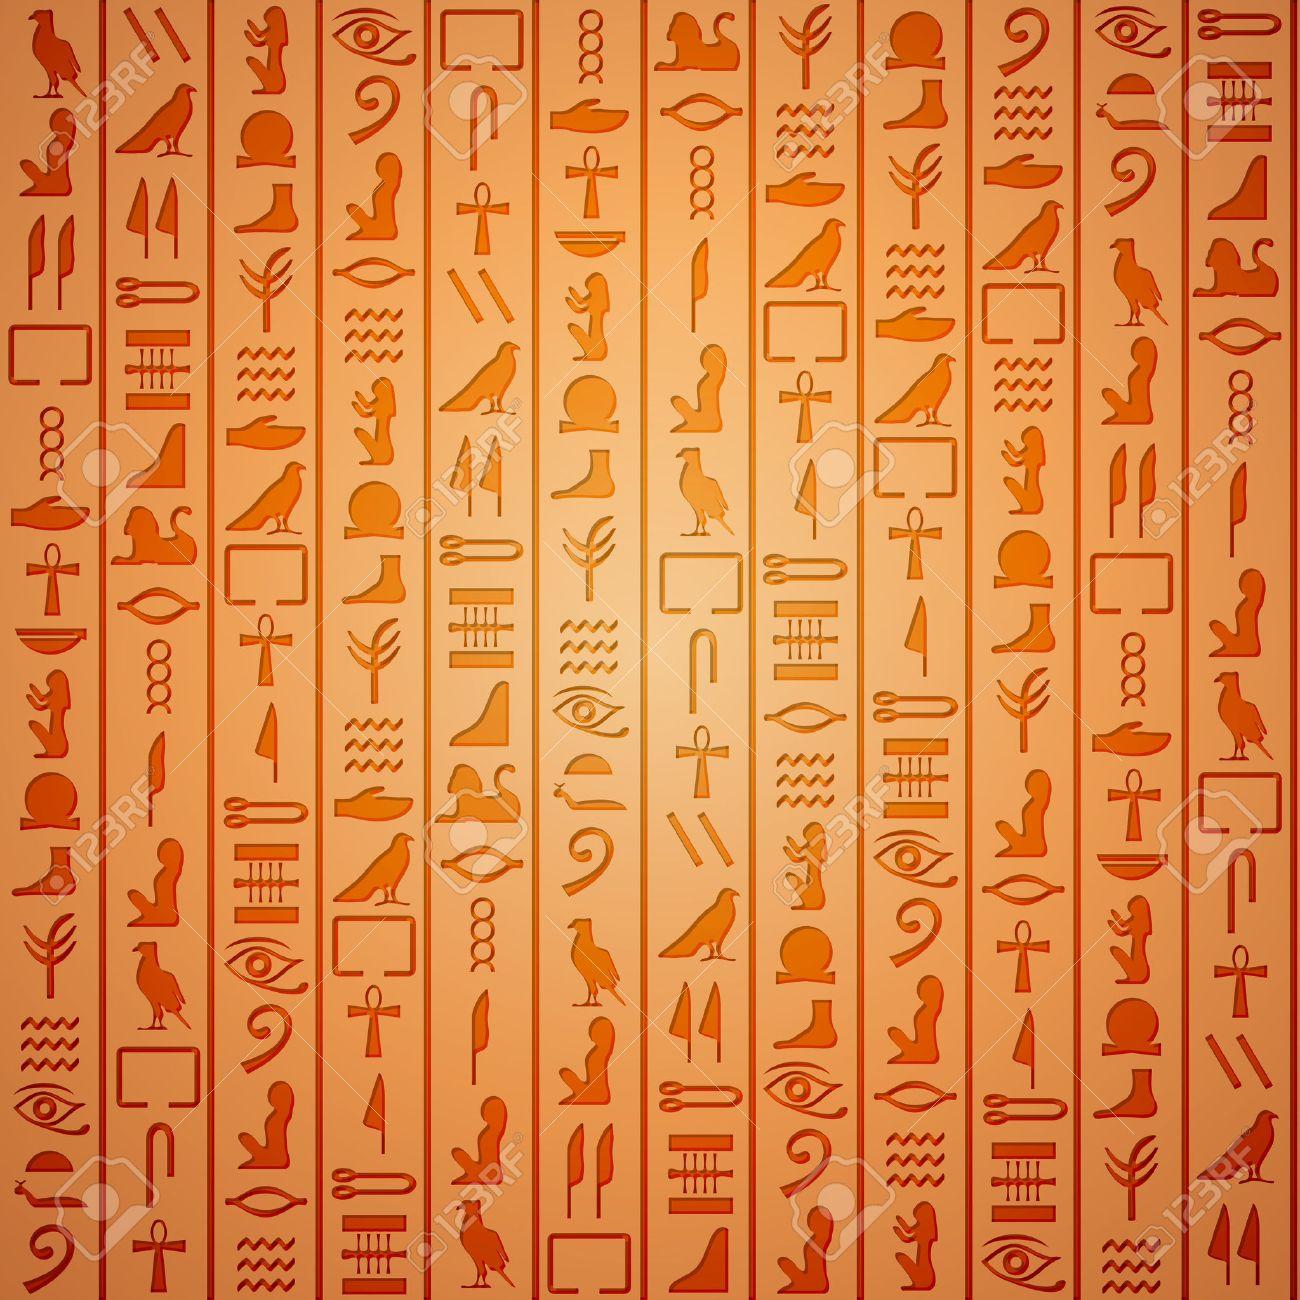 Egyptian hieroglyphics symbol ancient egyptian culture egyptian symbol ancient egyptian culture egyptian old writing vector illustration stock biocorpaavc Choice Image